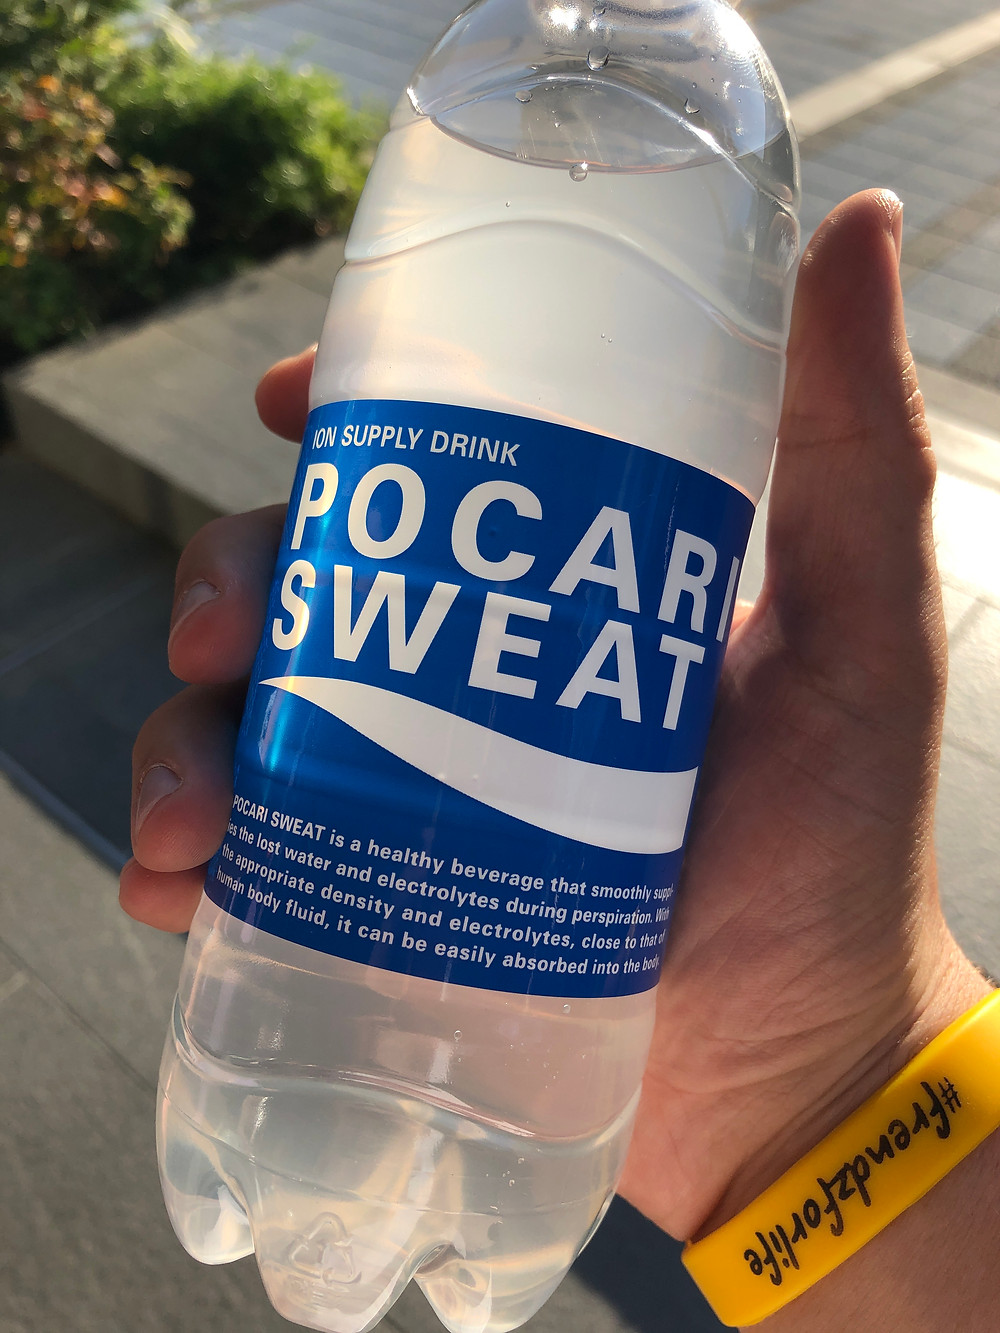 a traveler holding a bottle of Pocari Sweat, an electrolyte drink, in Tokyo Japan